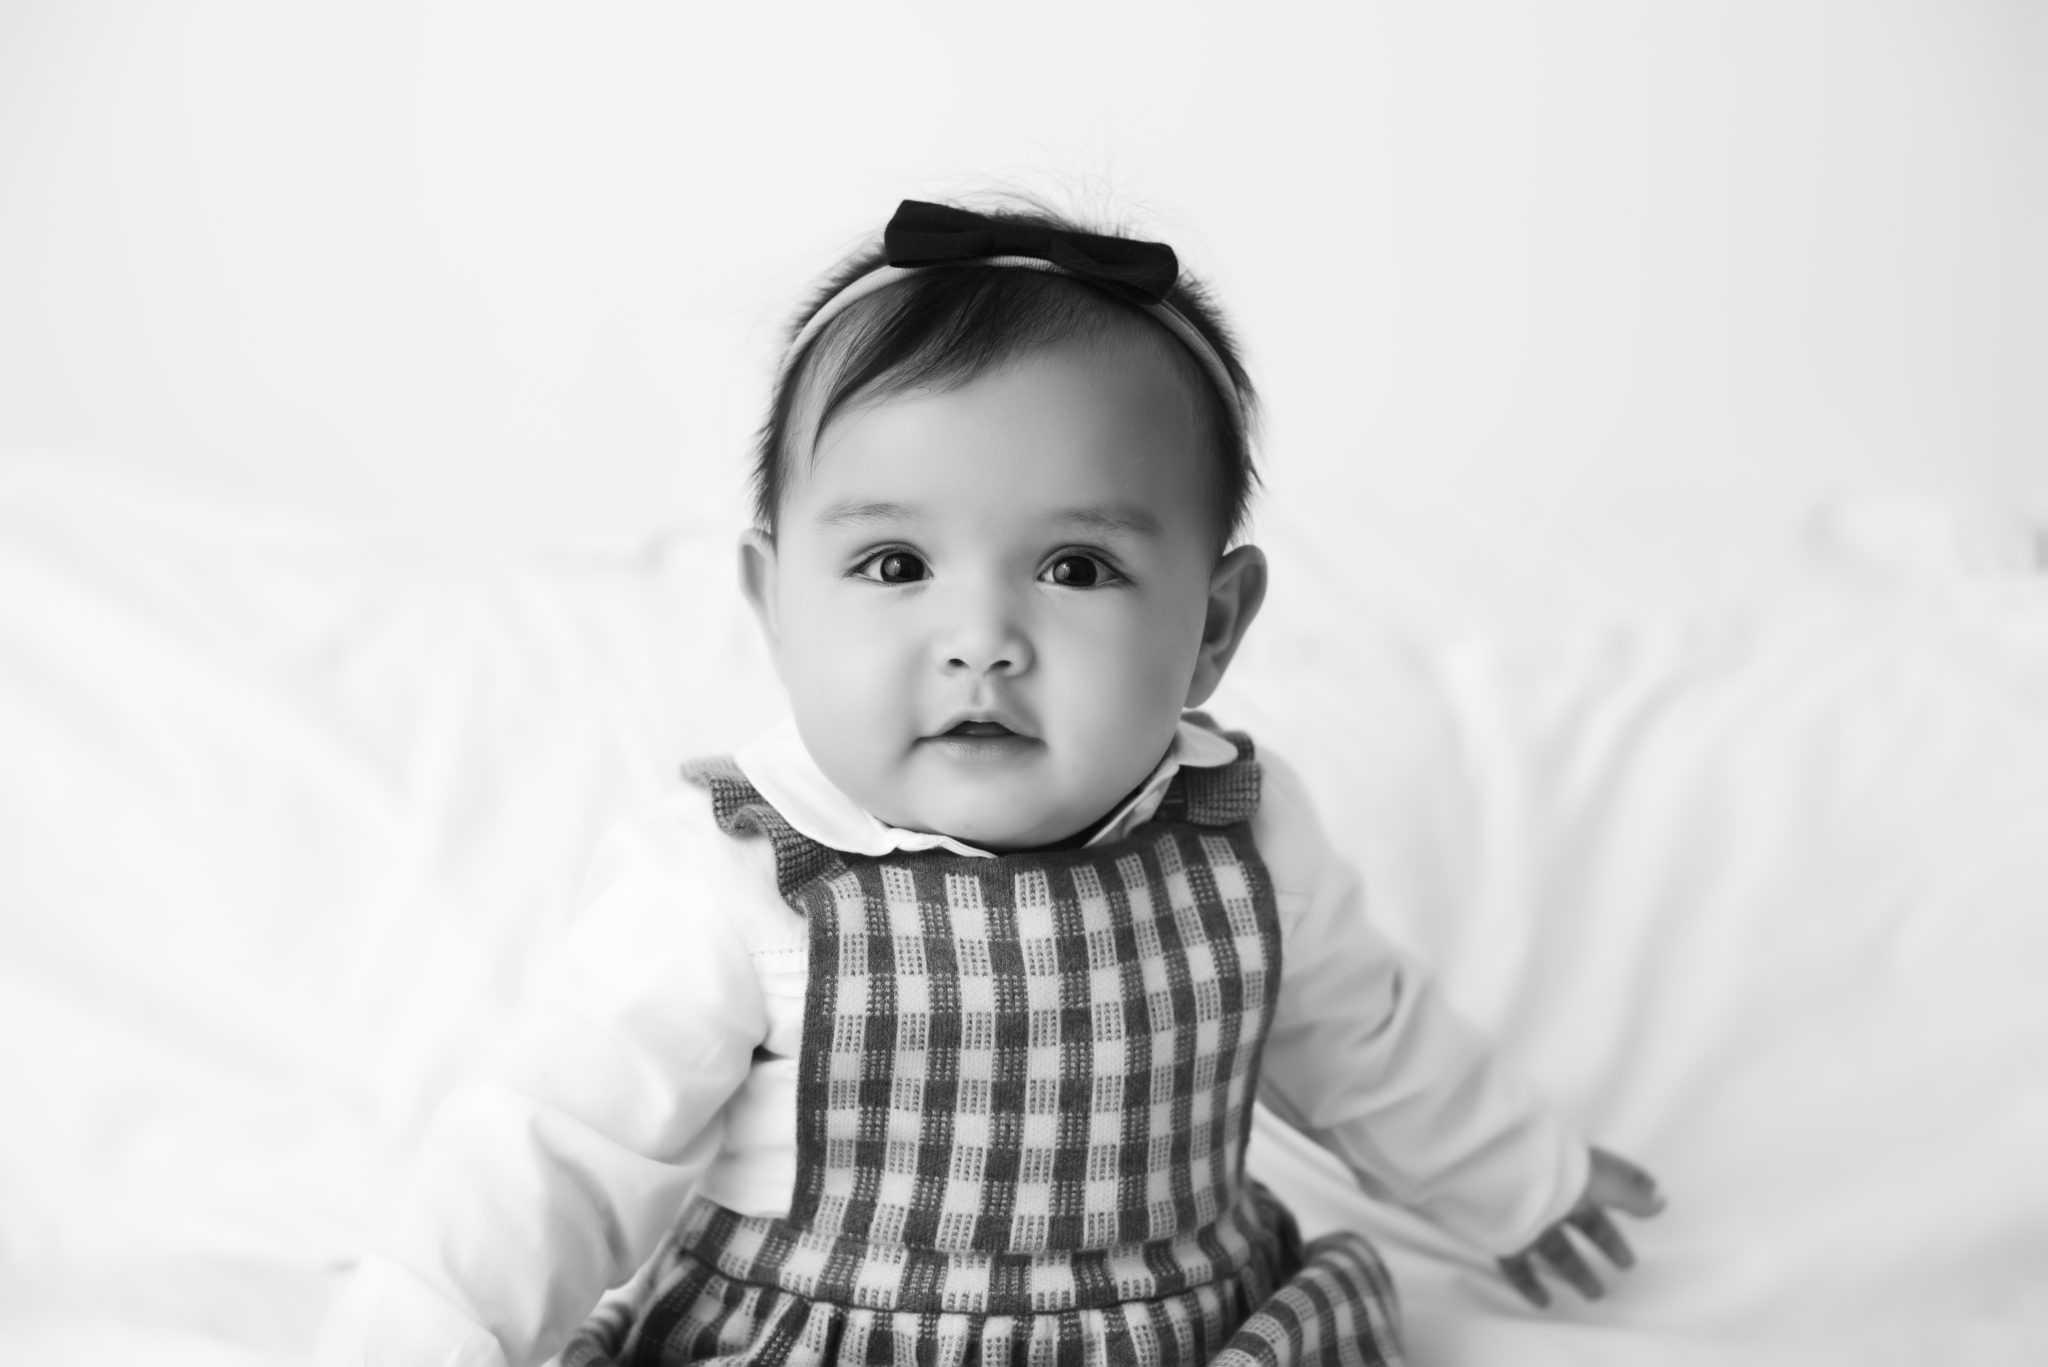 Black and white photos Stockport